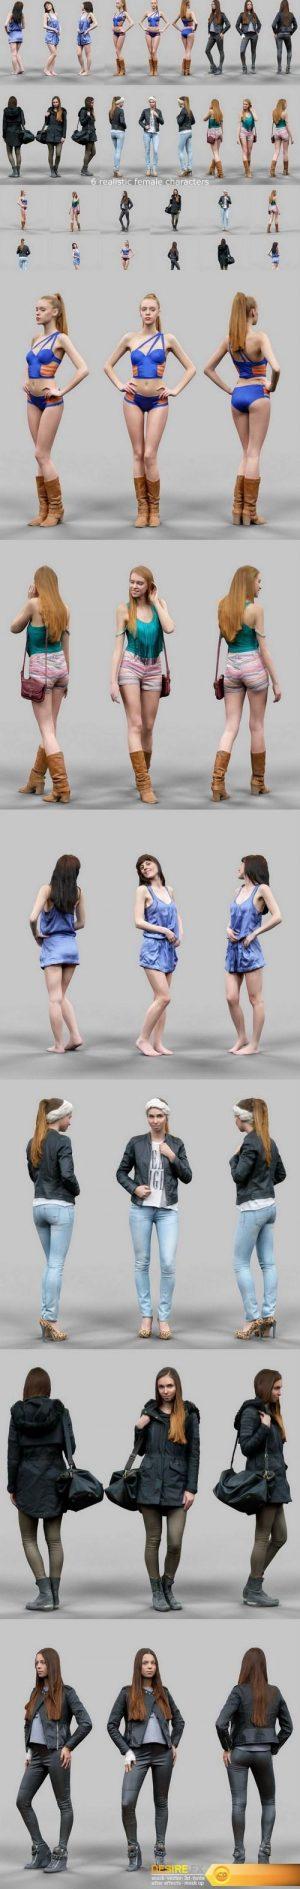 6 Realistic Female Characters Vol. 1 3D Model